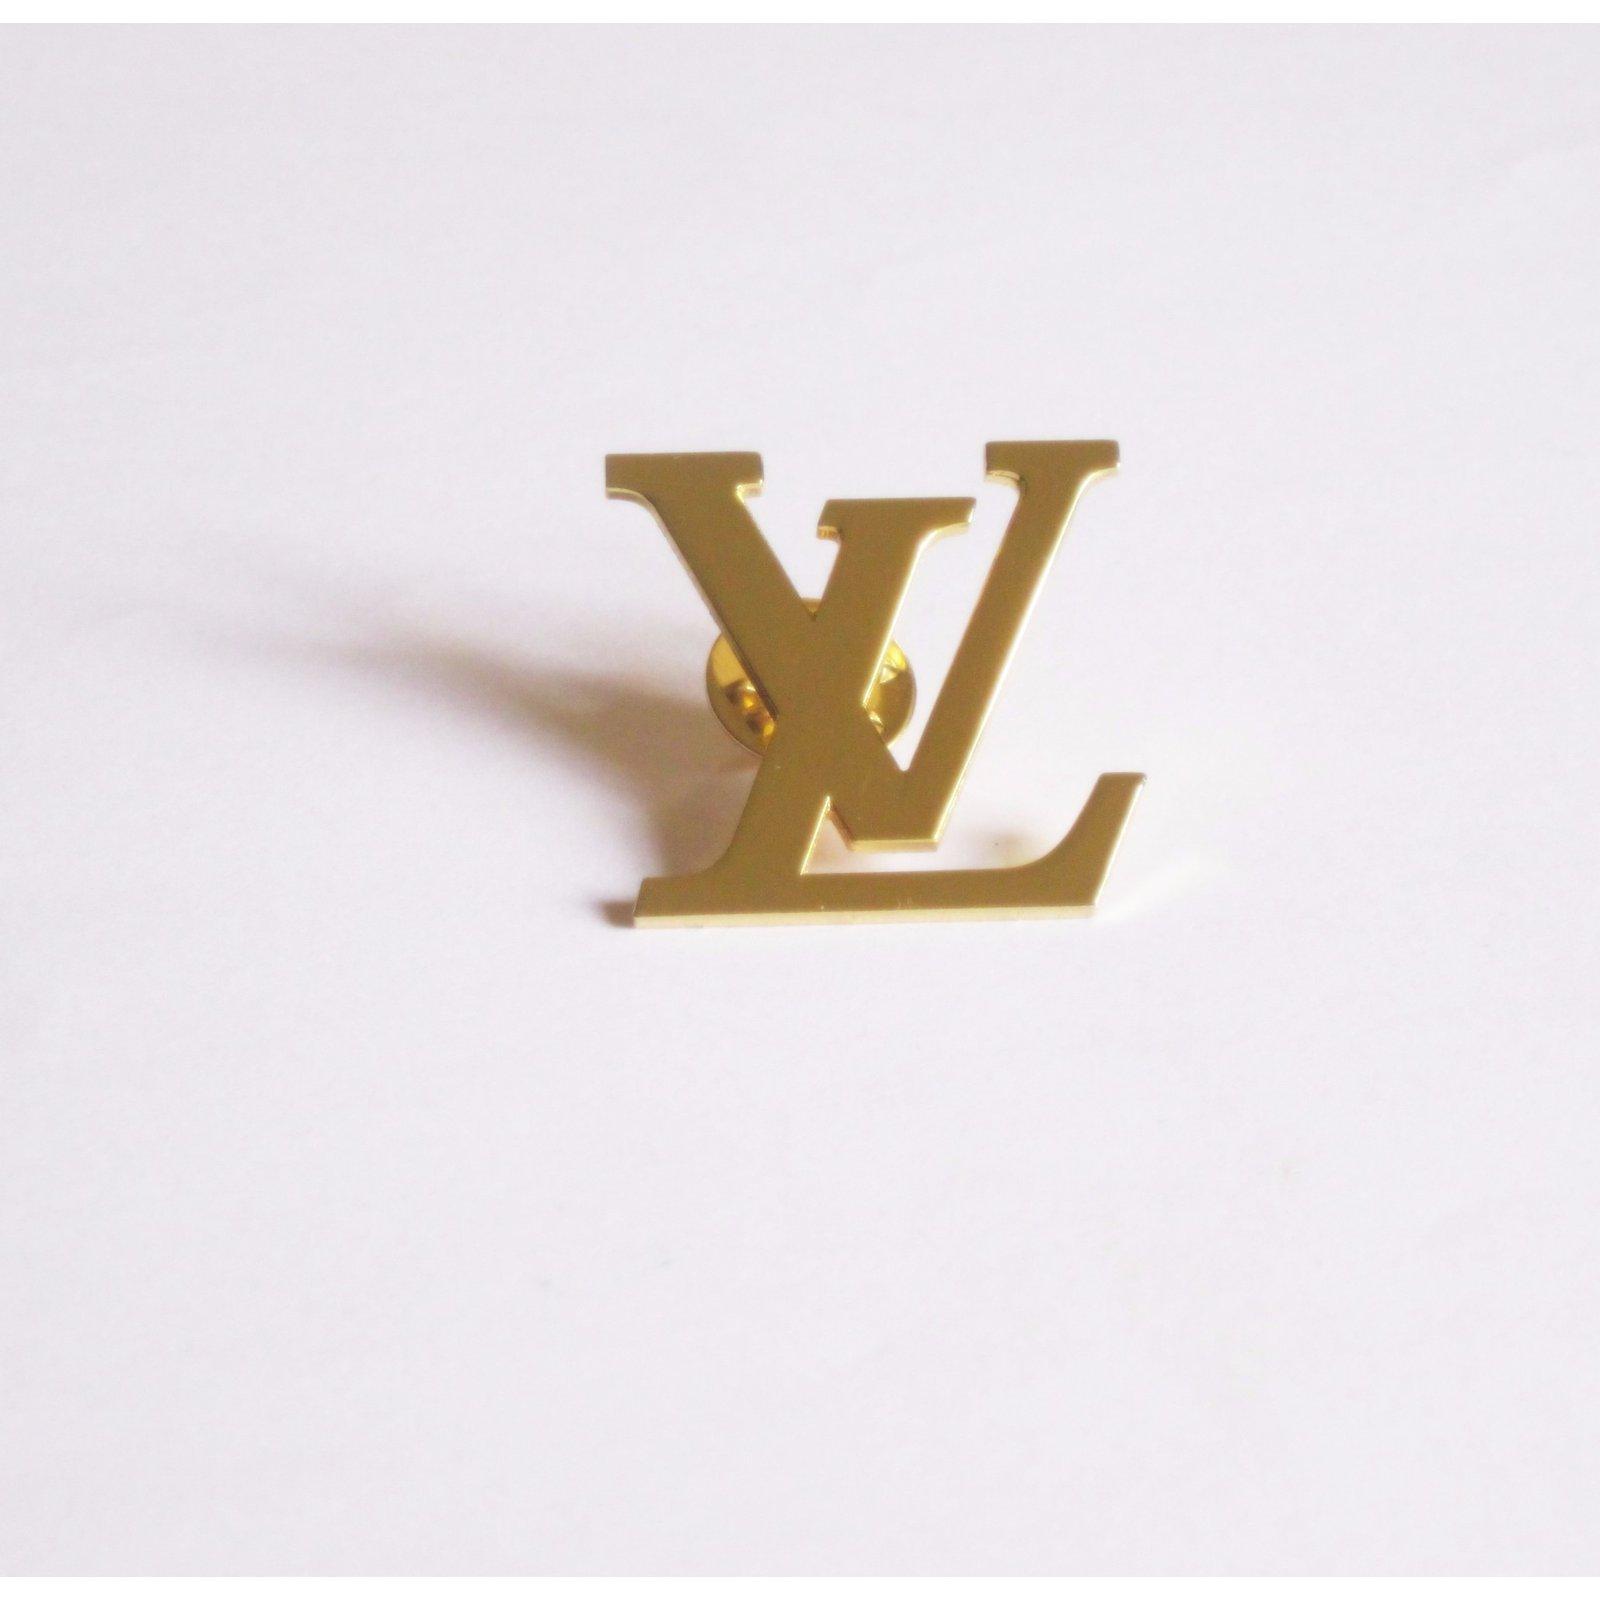 Broches Louis Vuitton Logo LV Mtal Dor Ref43246 Joli